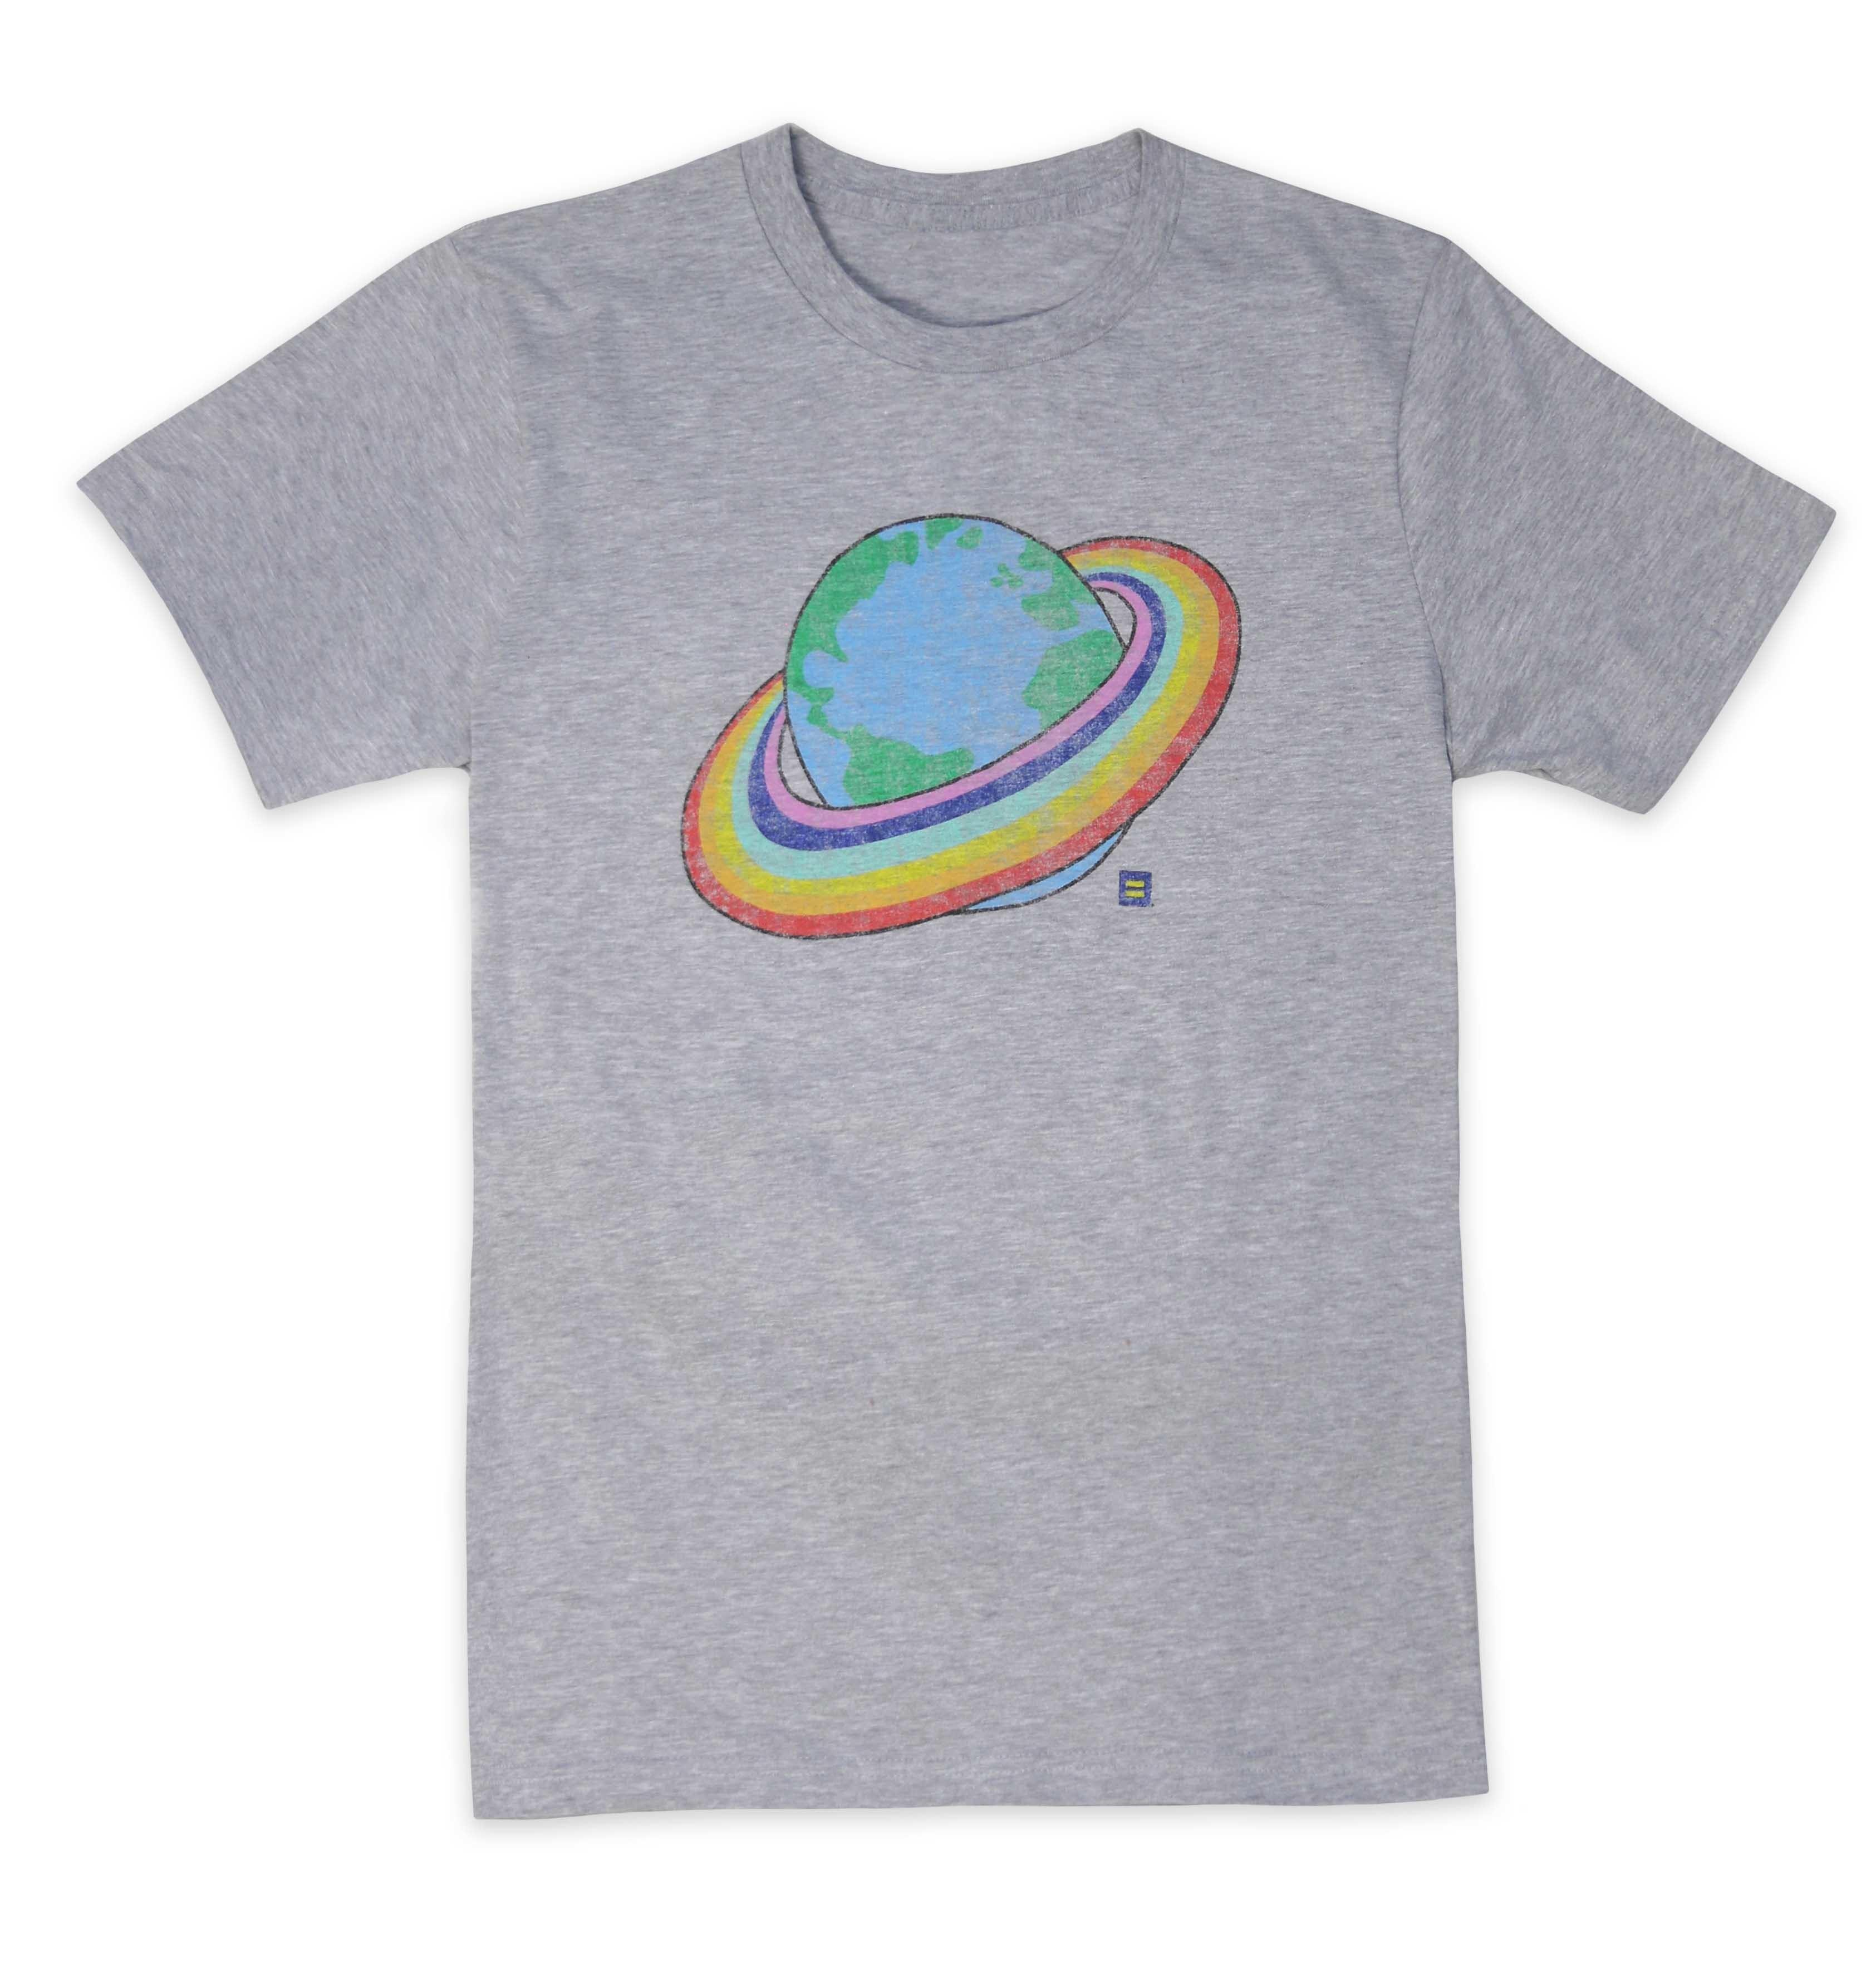 Rainbow-earth-tshirt.jpg?mtime=20181214115108#asset:104076